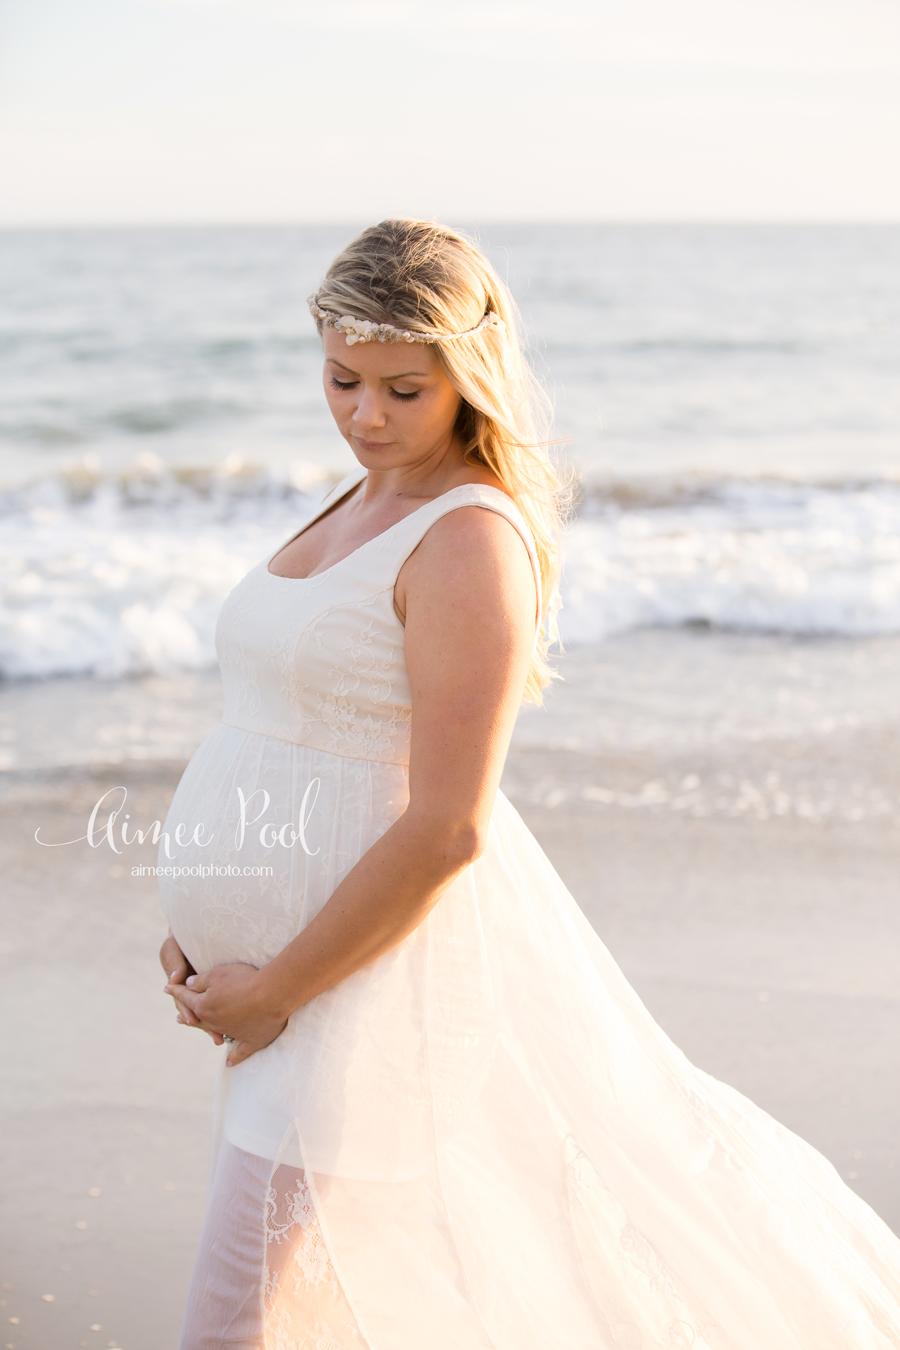 Monterey Pregnancy Photographer - Maternity Beach Session